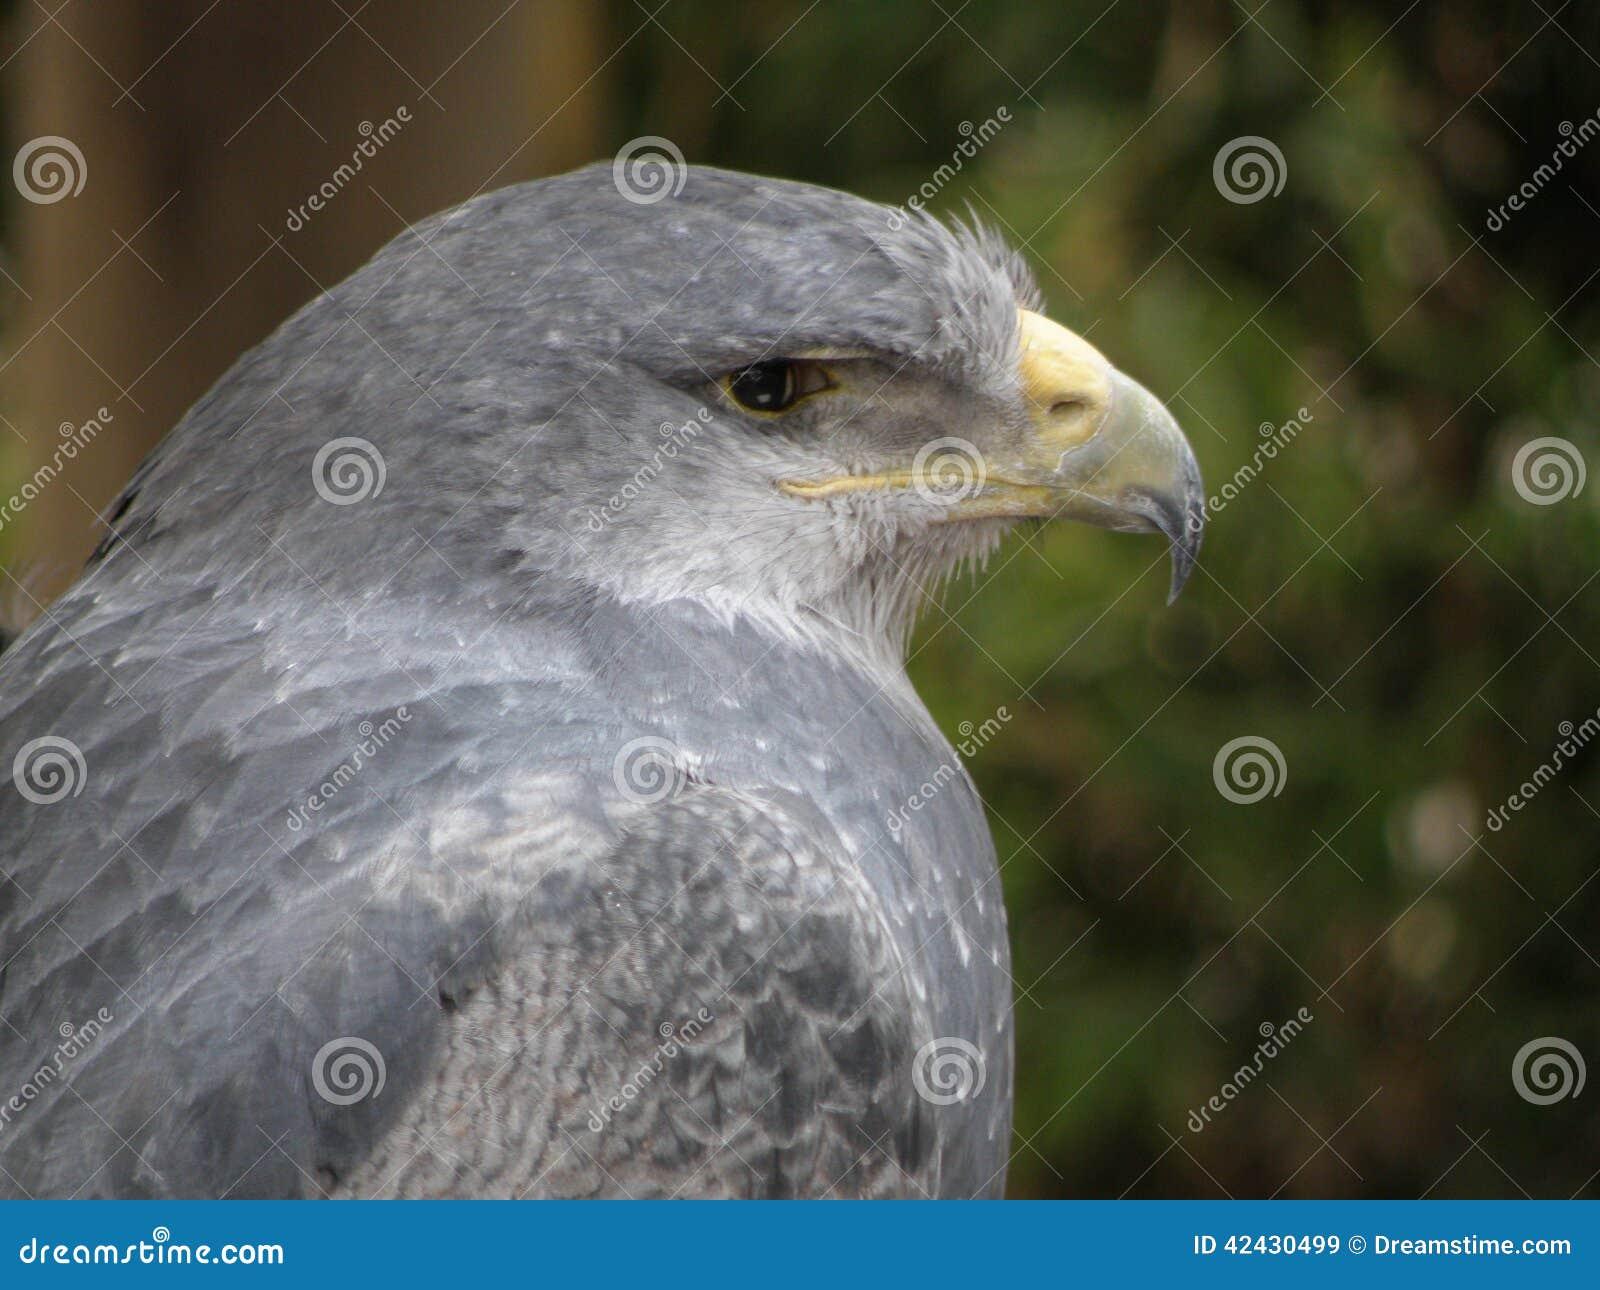 Águila triste en cautiverio